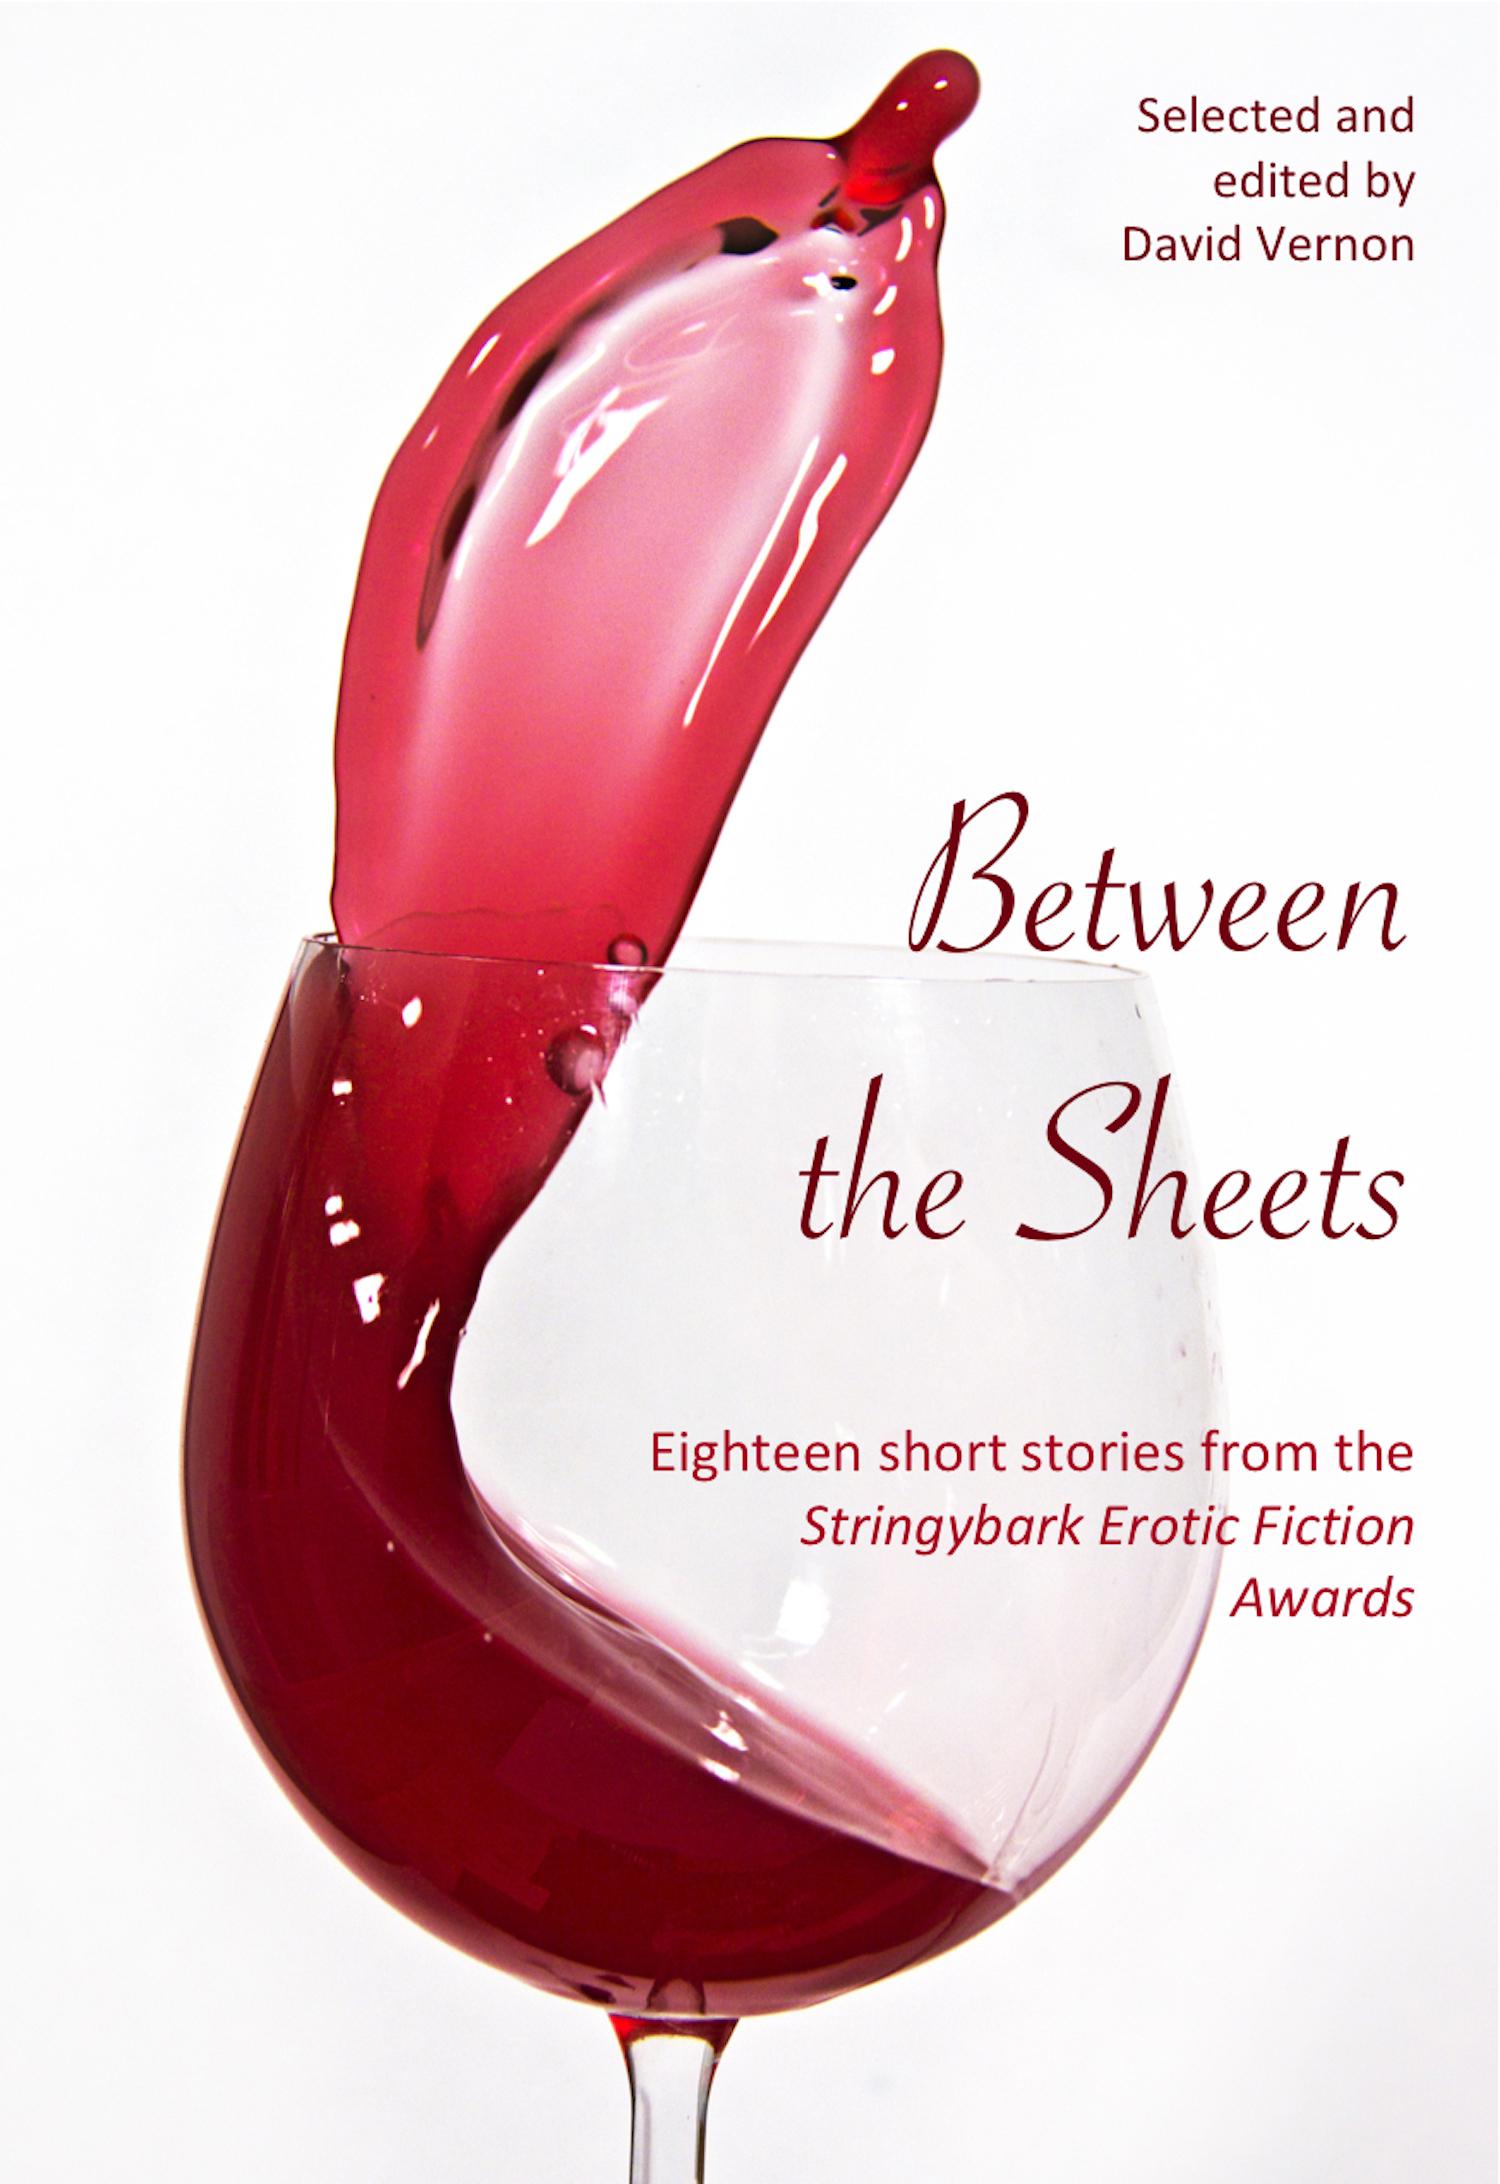 Short erotic fiction stories